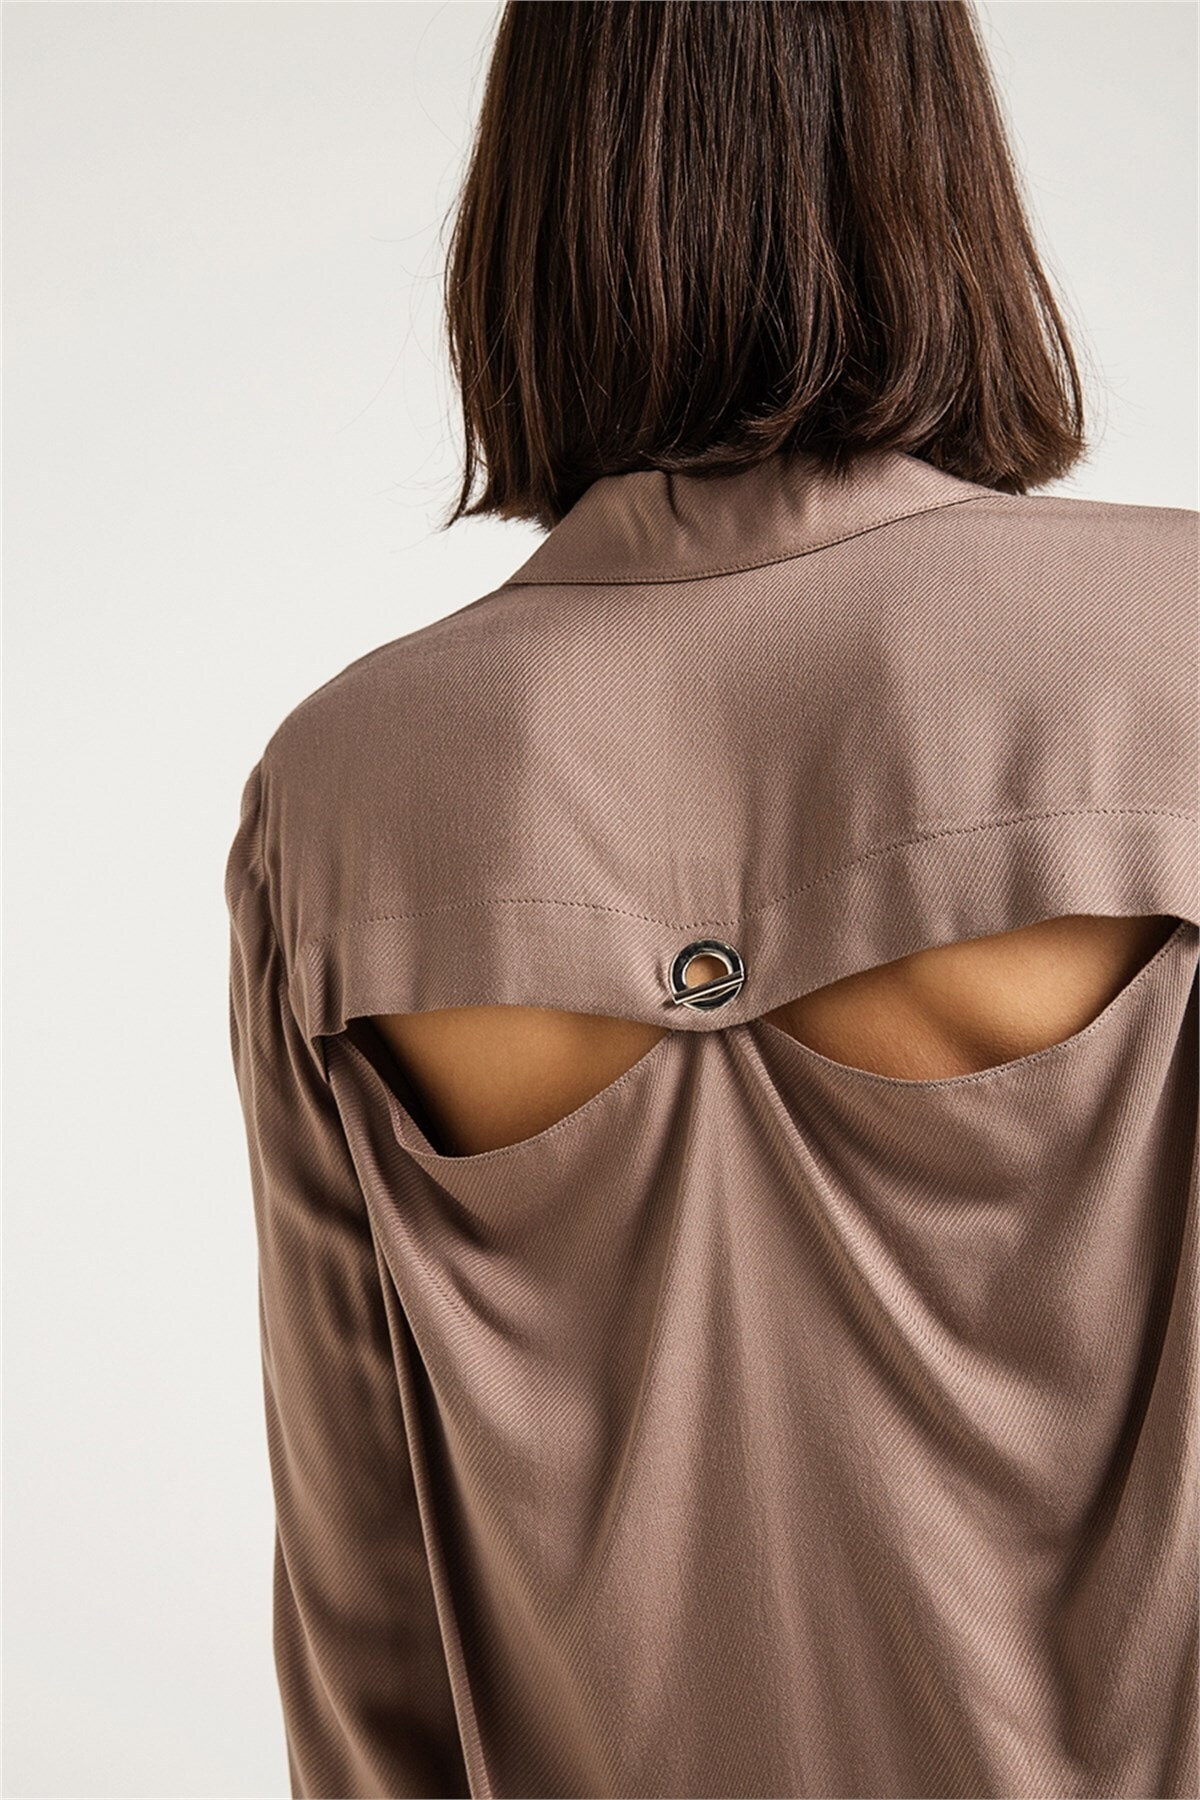 rue. Sırt Dekolteli Salaş Formlu Kadın Gömlek Vizon 2